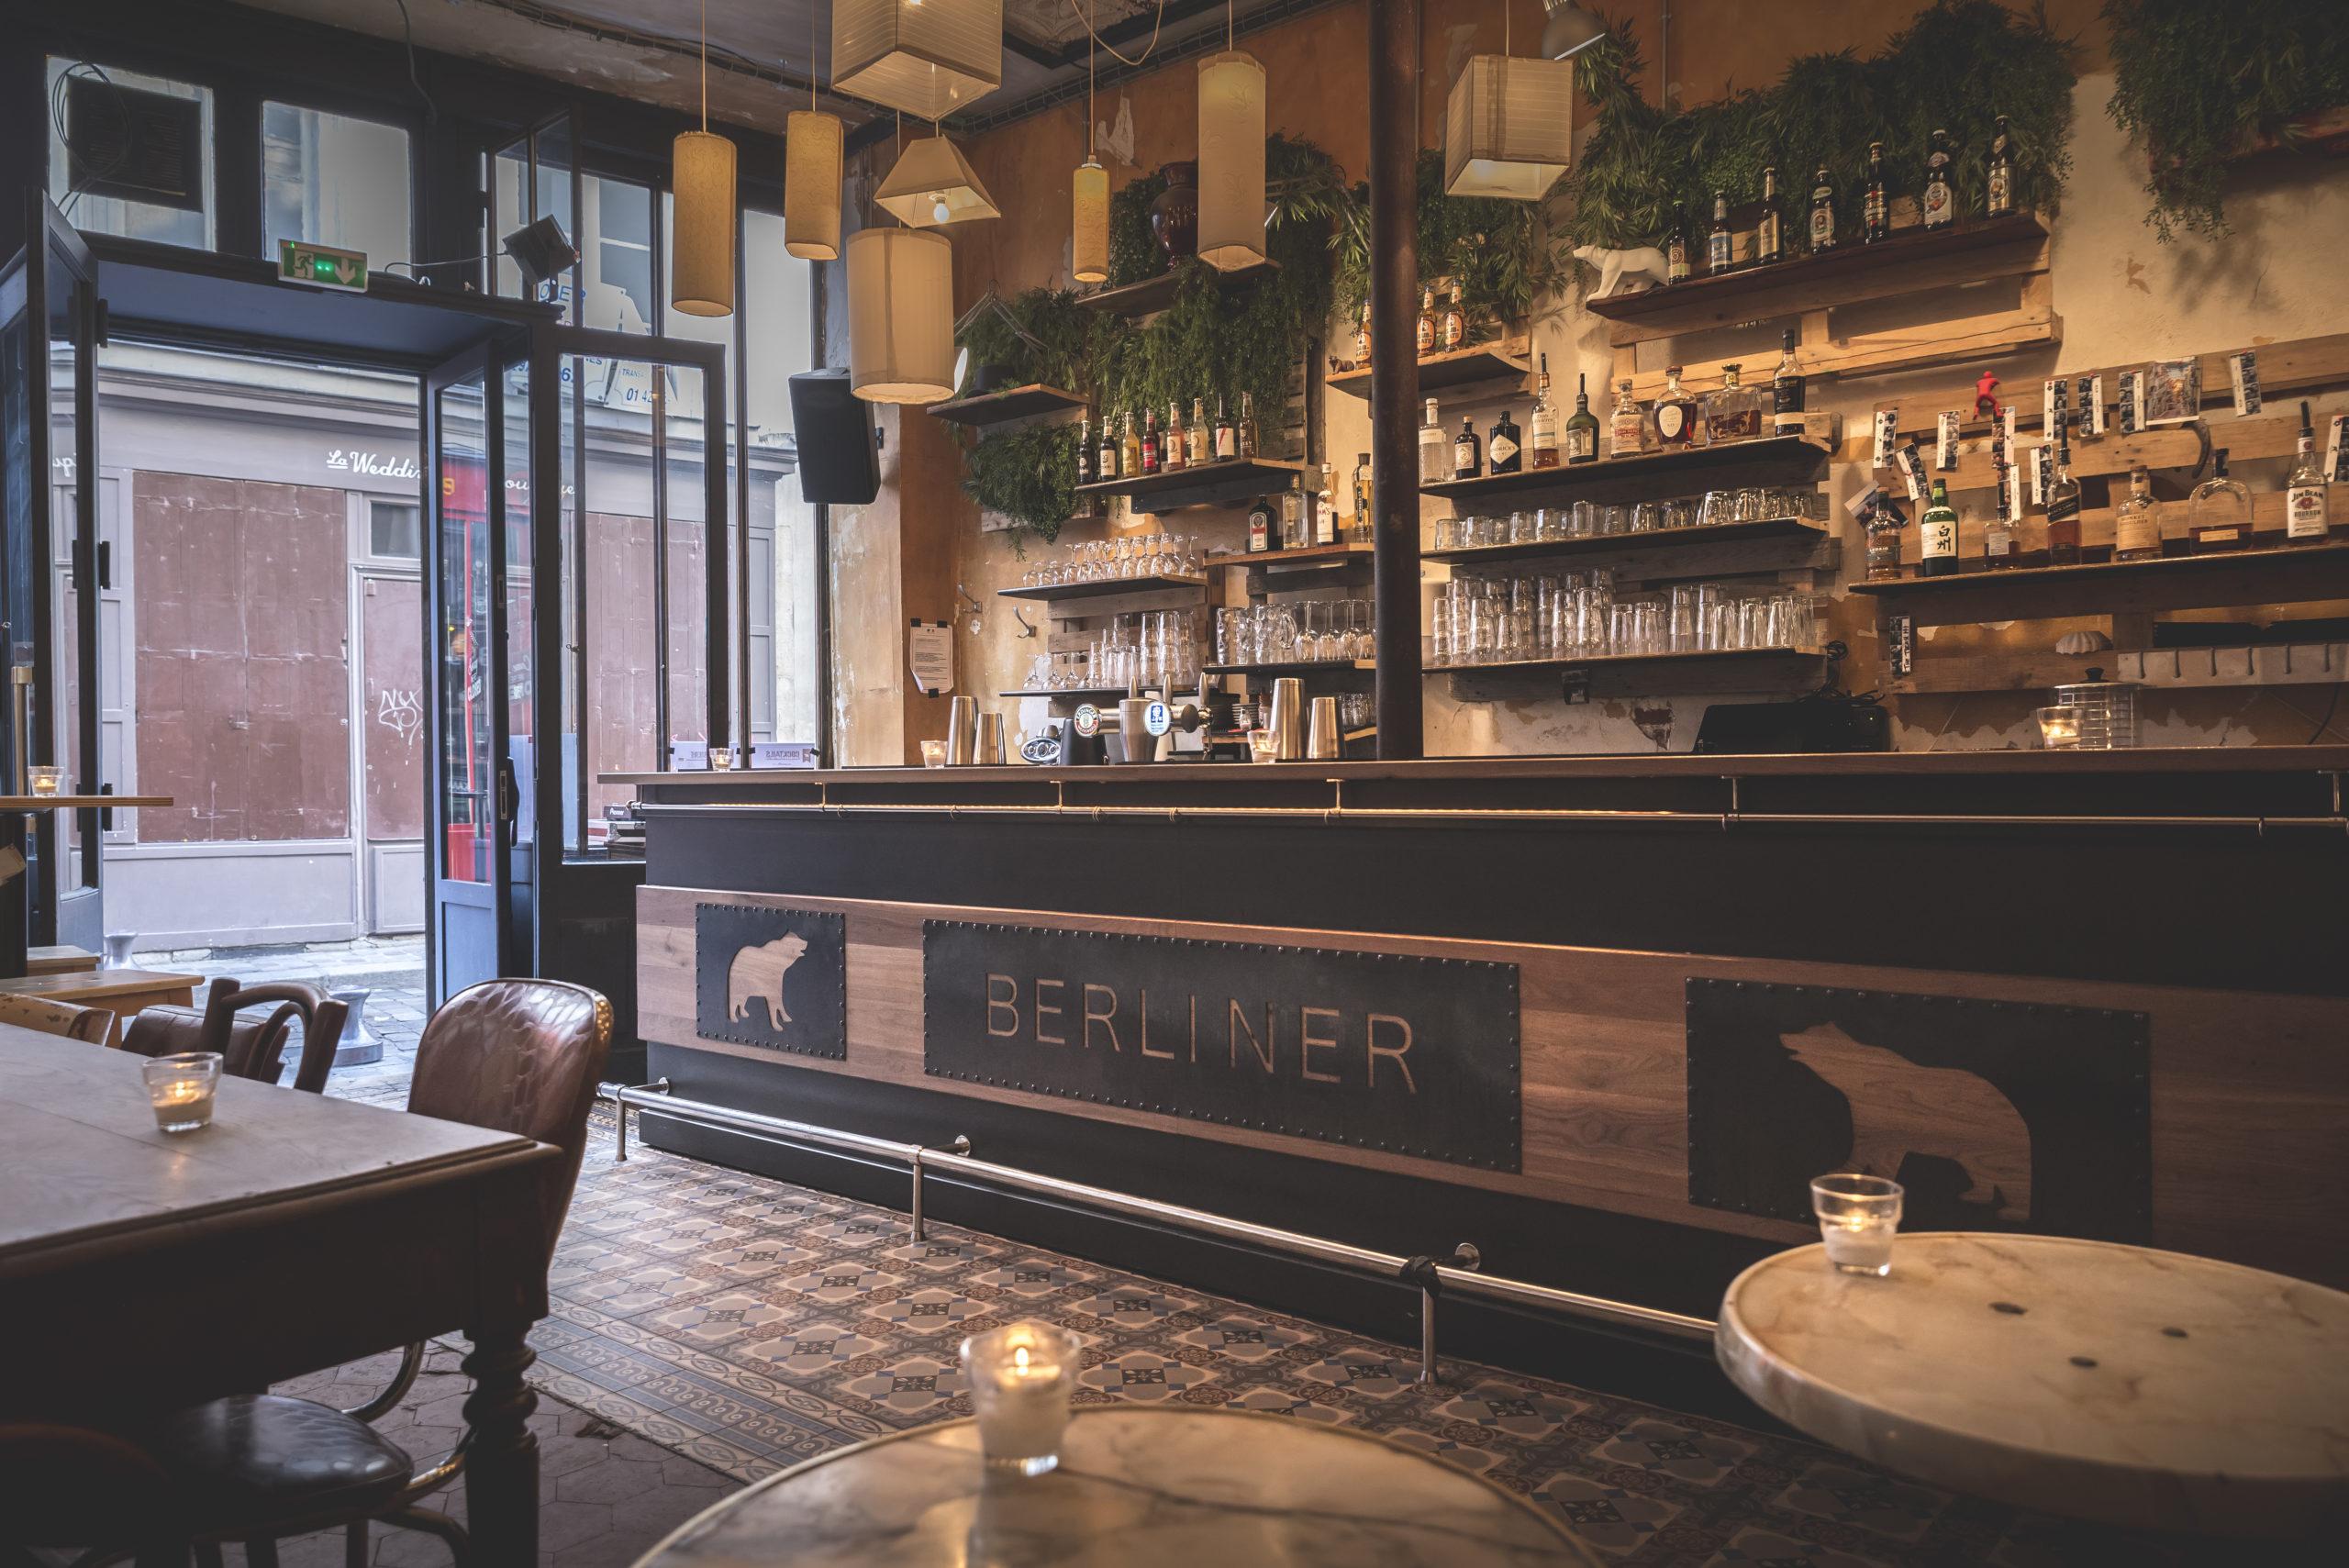 Berliner Wunderbar - Bar à bières allemand - Paris